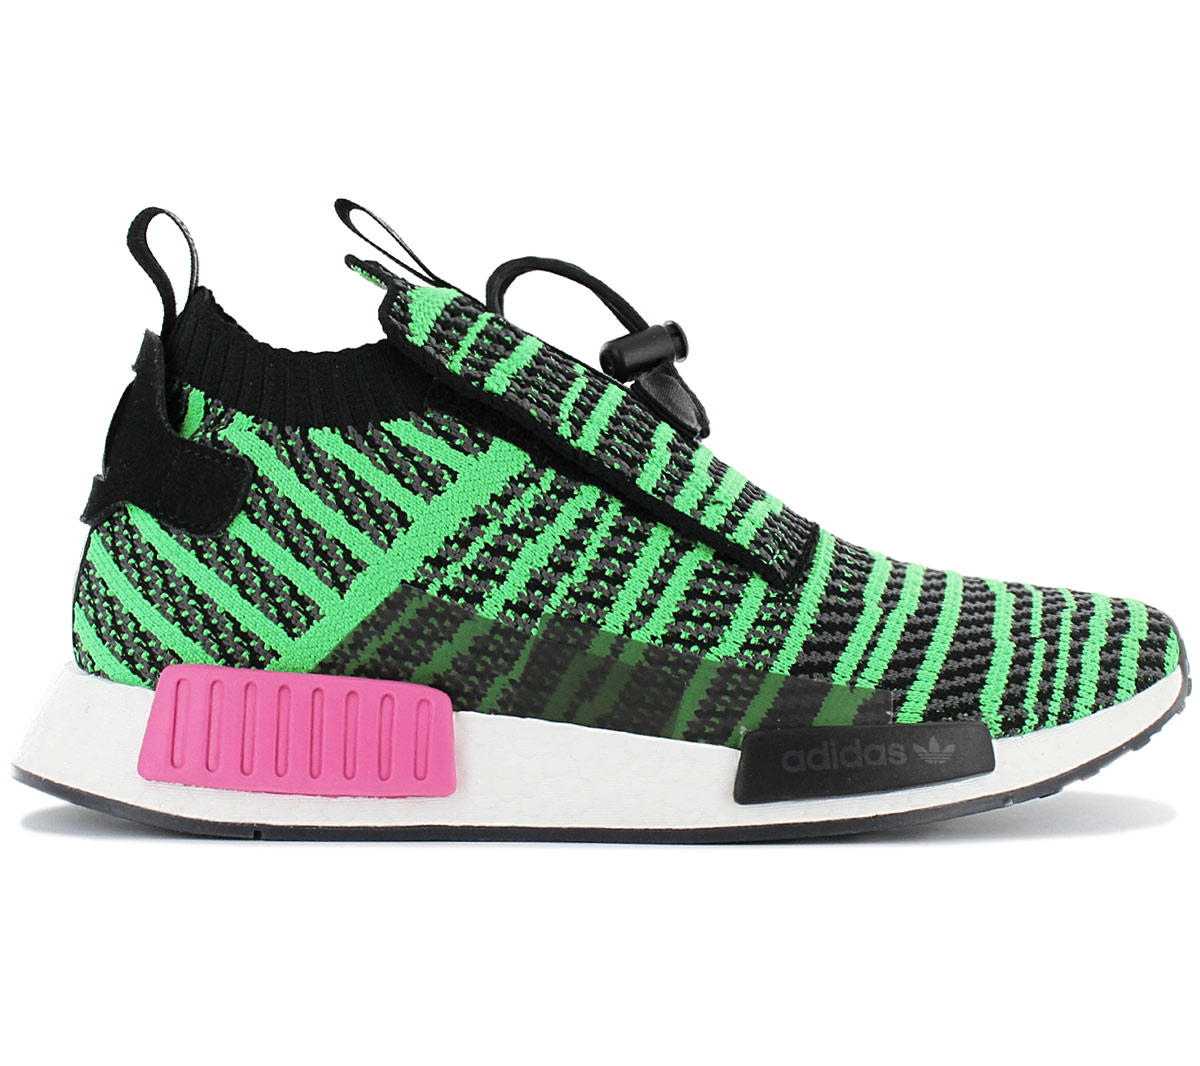 adidas Originals NMD R2 PK Verde Scarpe Sneakers basse